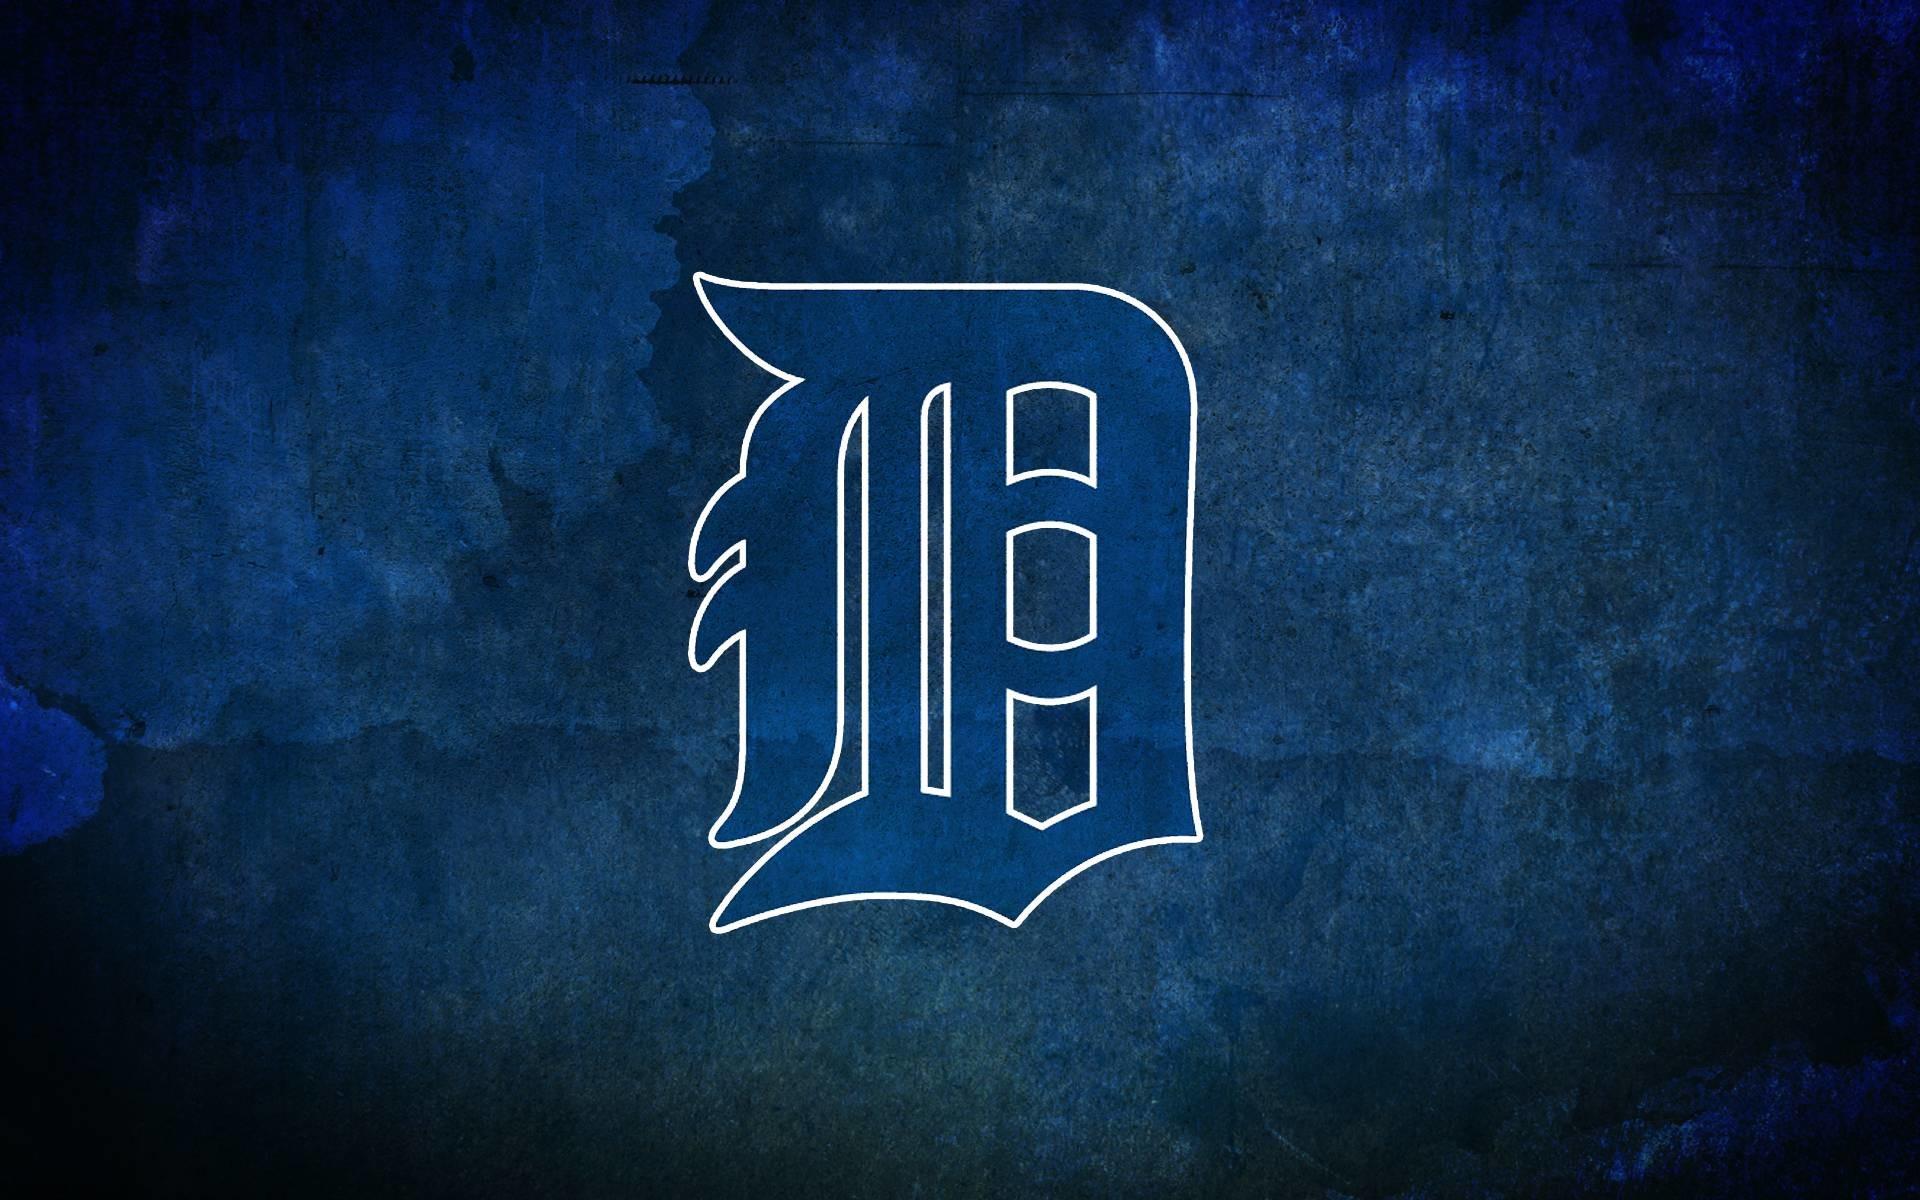 1920x1200 Detroit Tigers Cool Wallpapers 24857 Images   wallgraf.